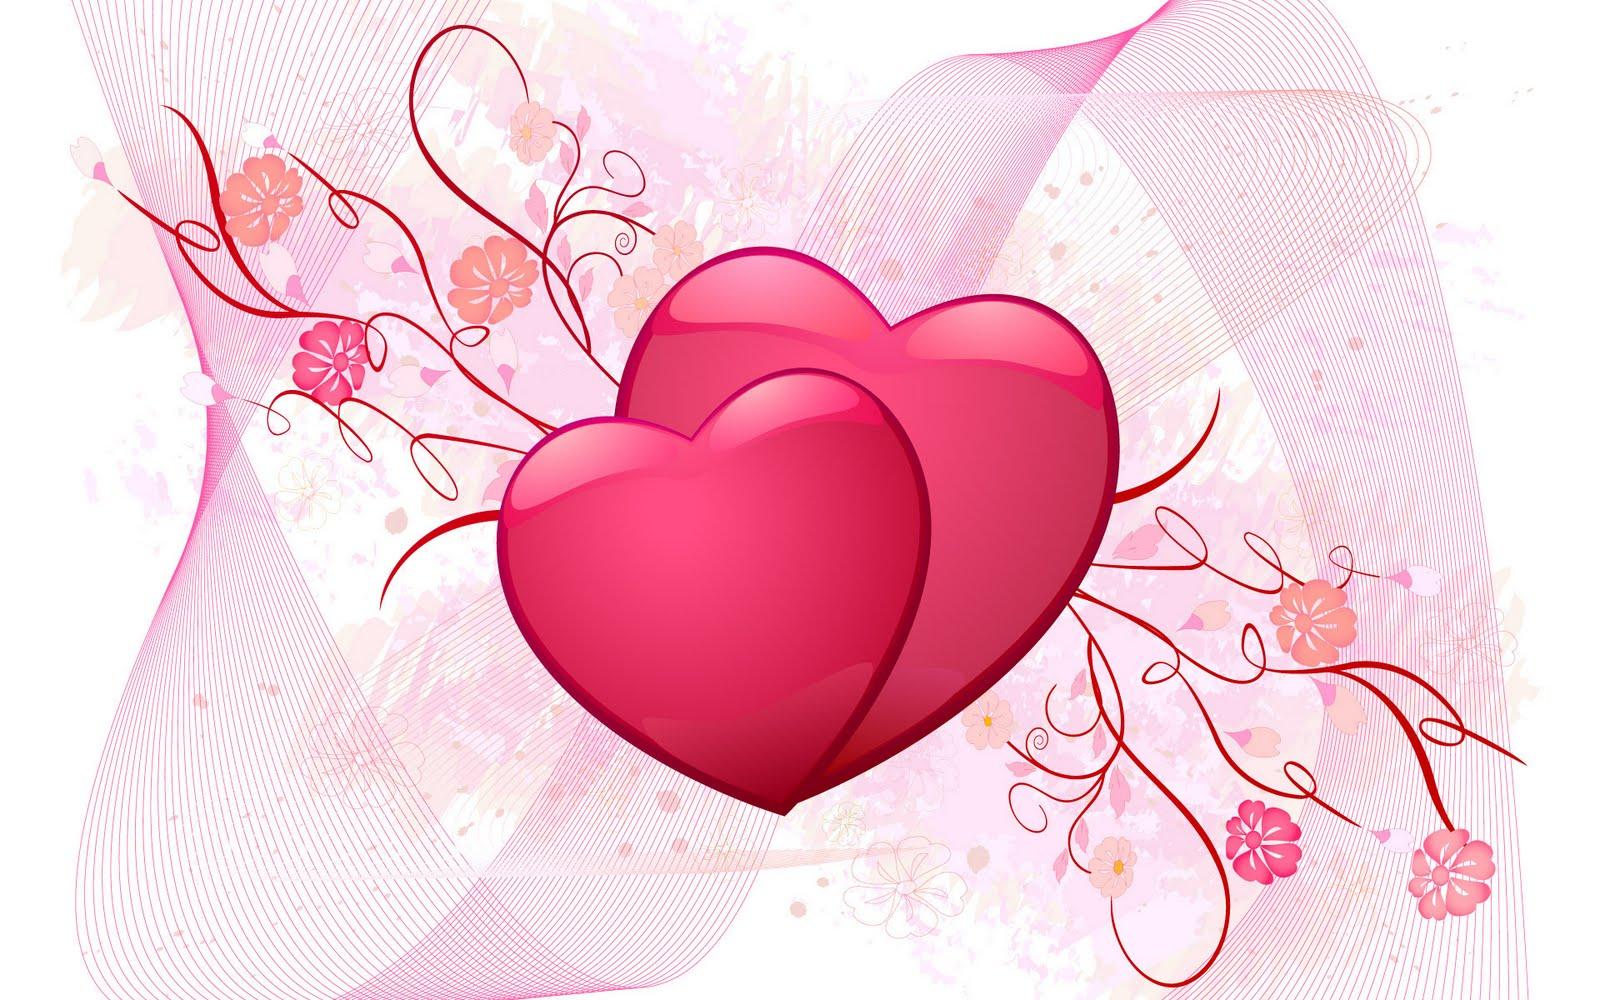 http://1.bp.blogspot.com/-OEFFrMJiHBE/ThX2xQtcOEI/AAAAAAAAAd0/vWCF6lldBgU/s1600/Love-wallpaper-love-4187609-1920-1200.jpg